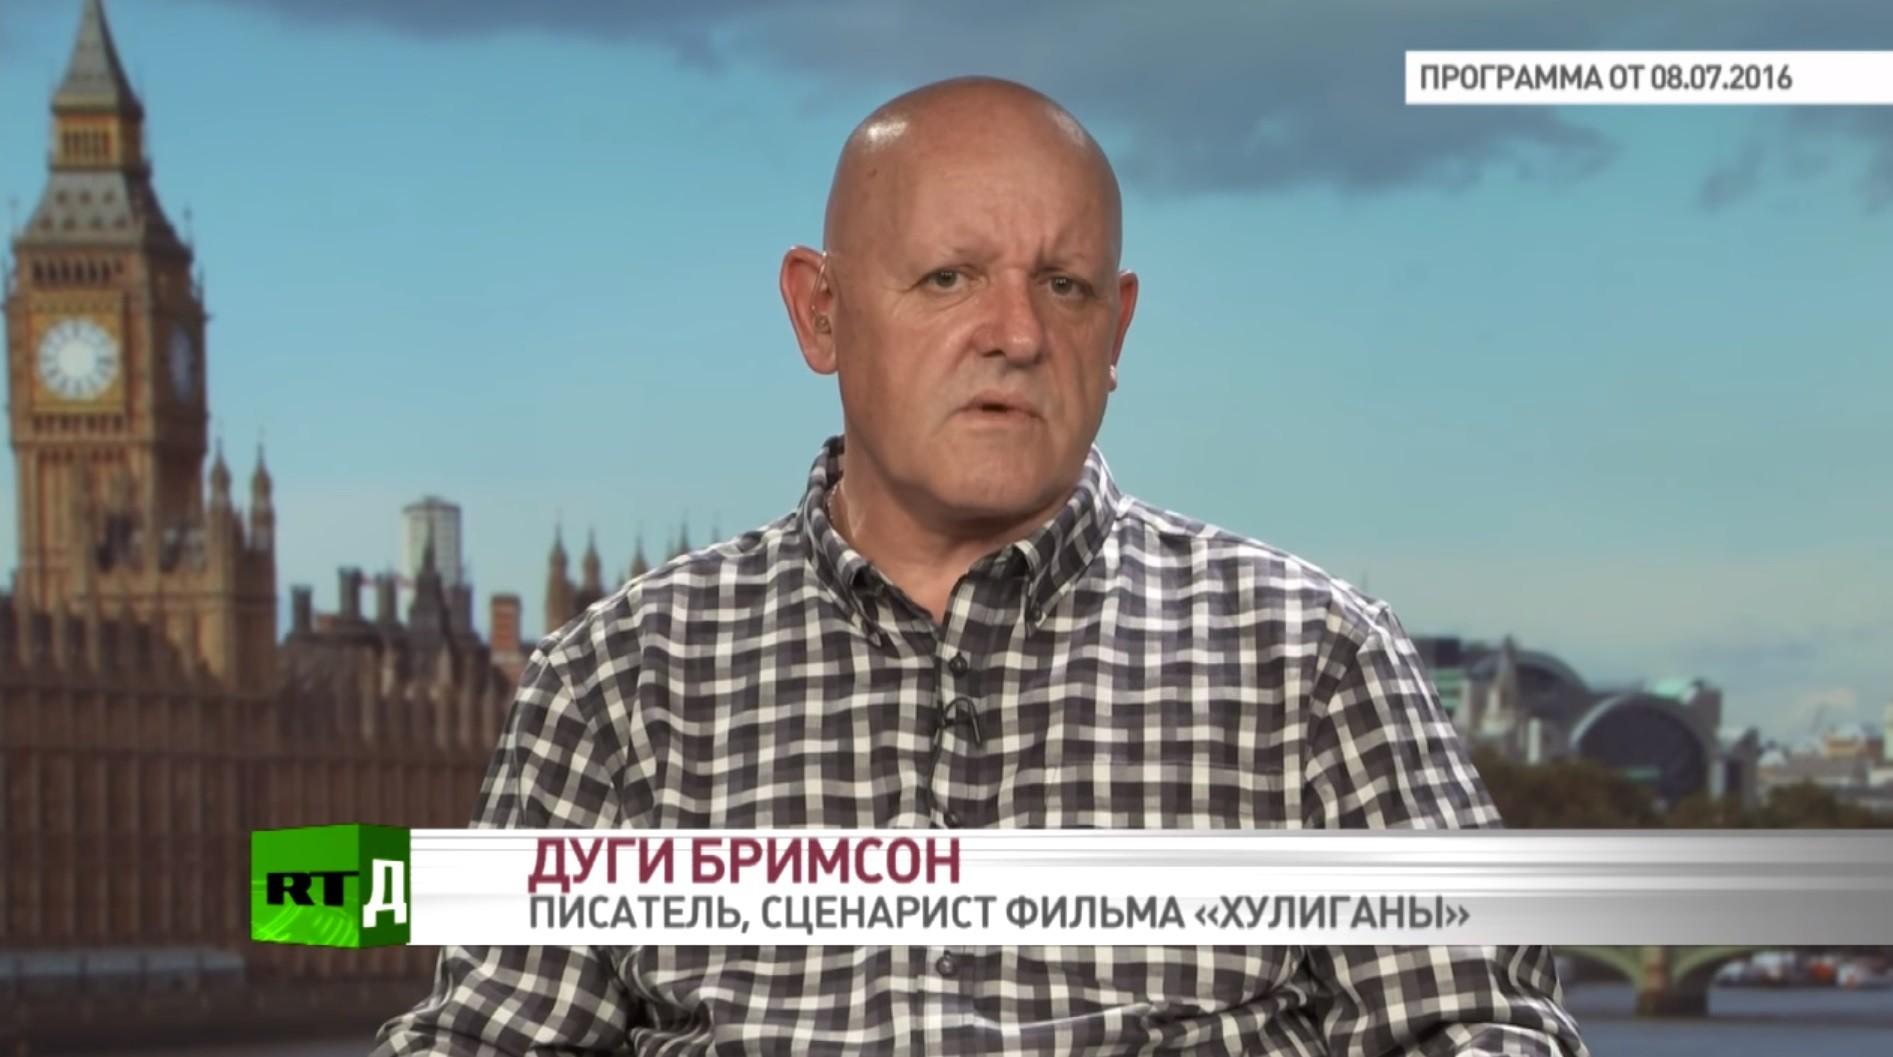 Дуги Бримсон на RTД: Британские СМИ демонизируют российских фанатов